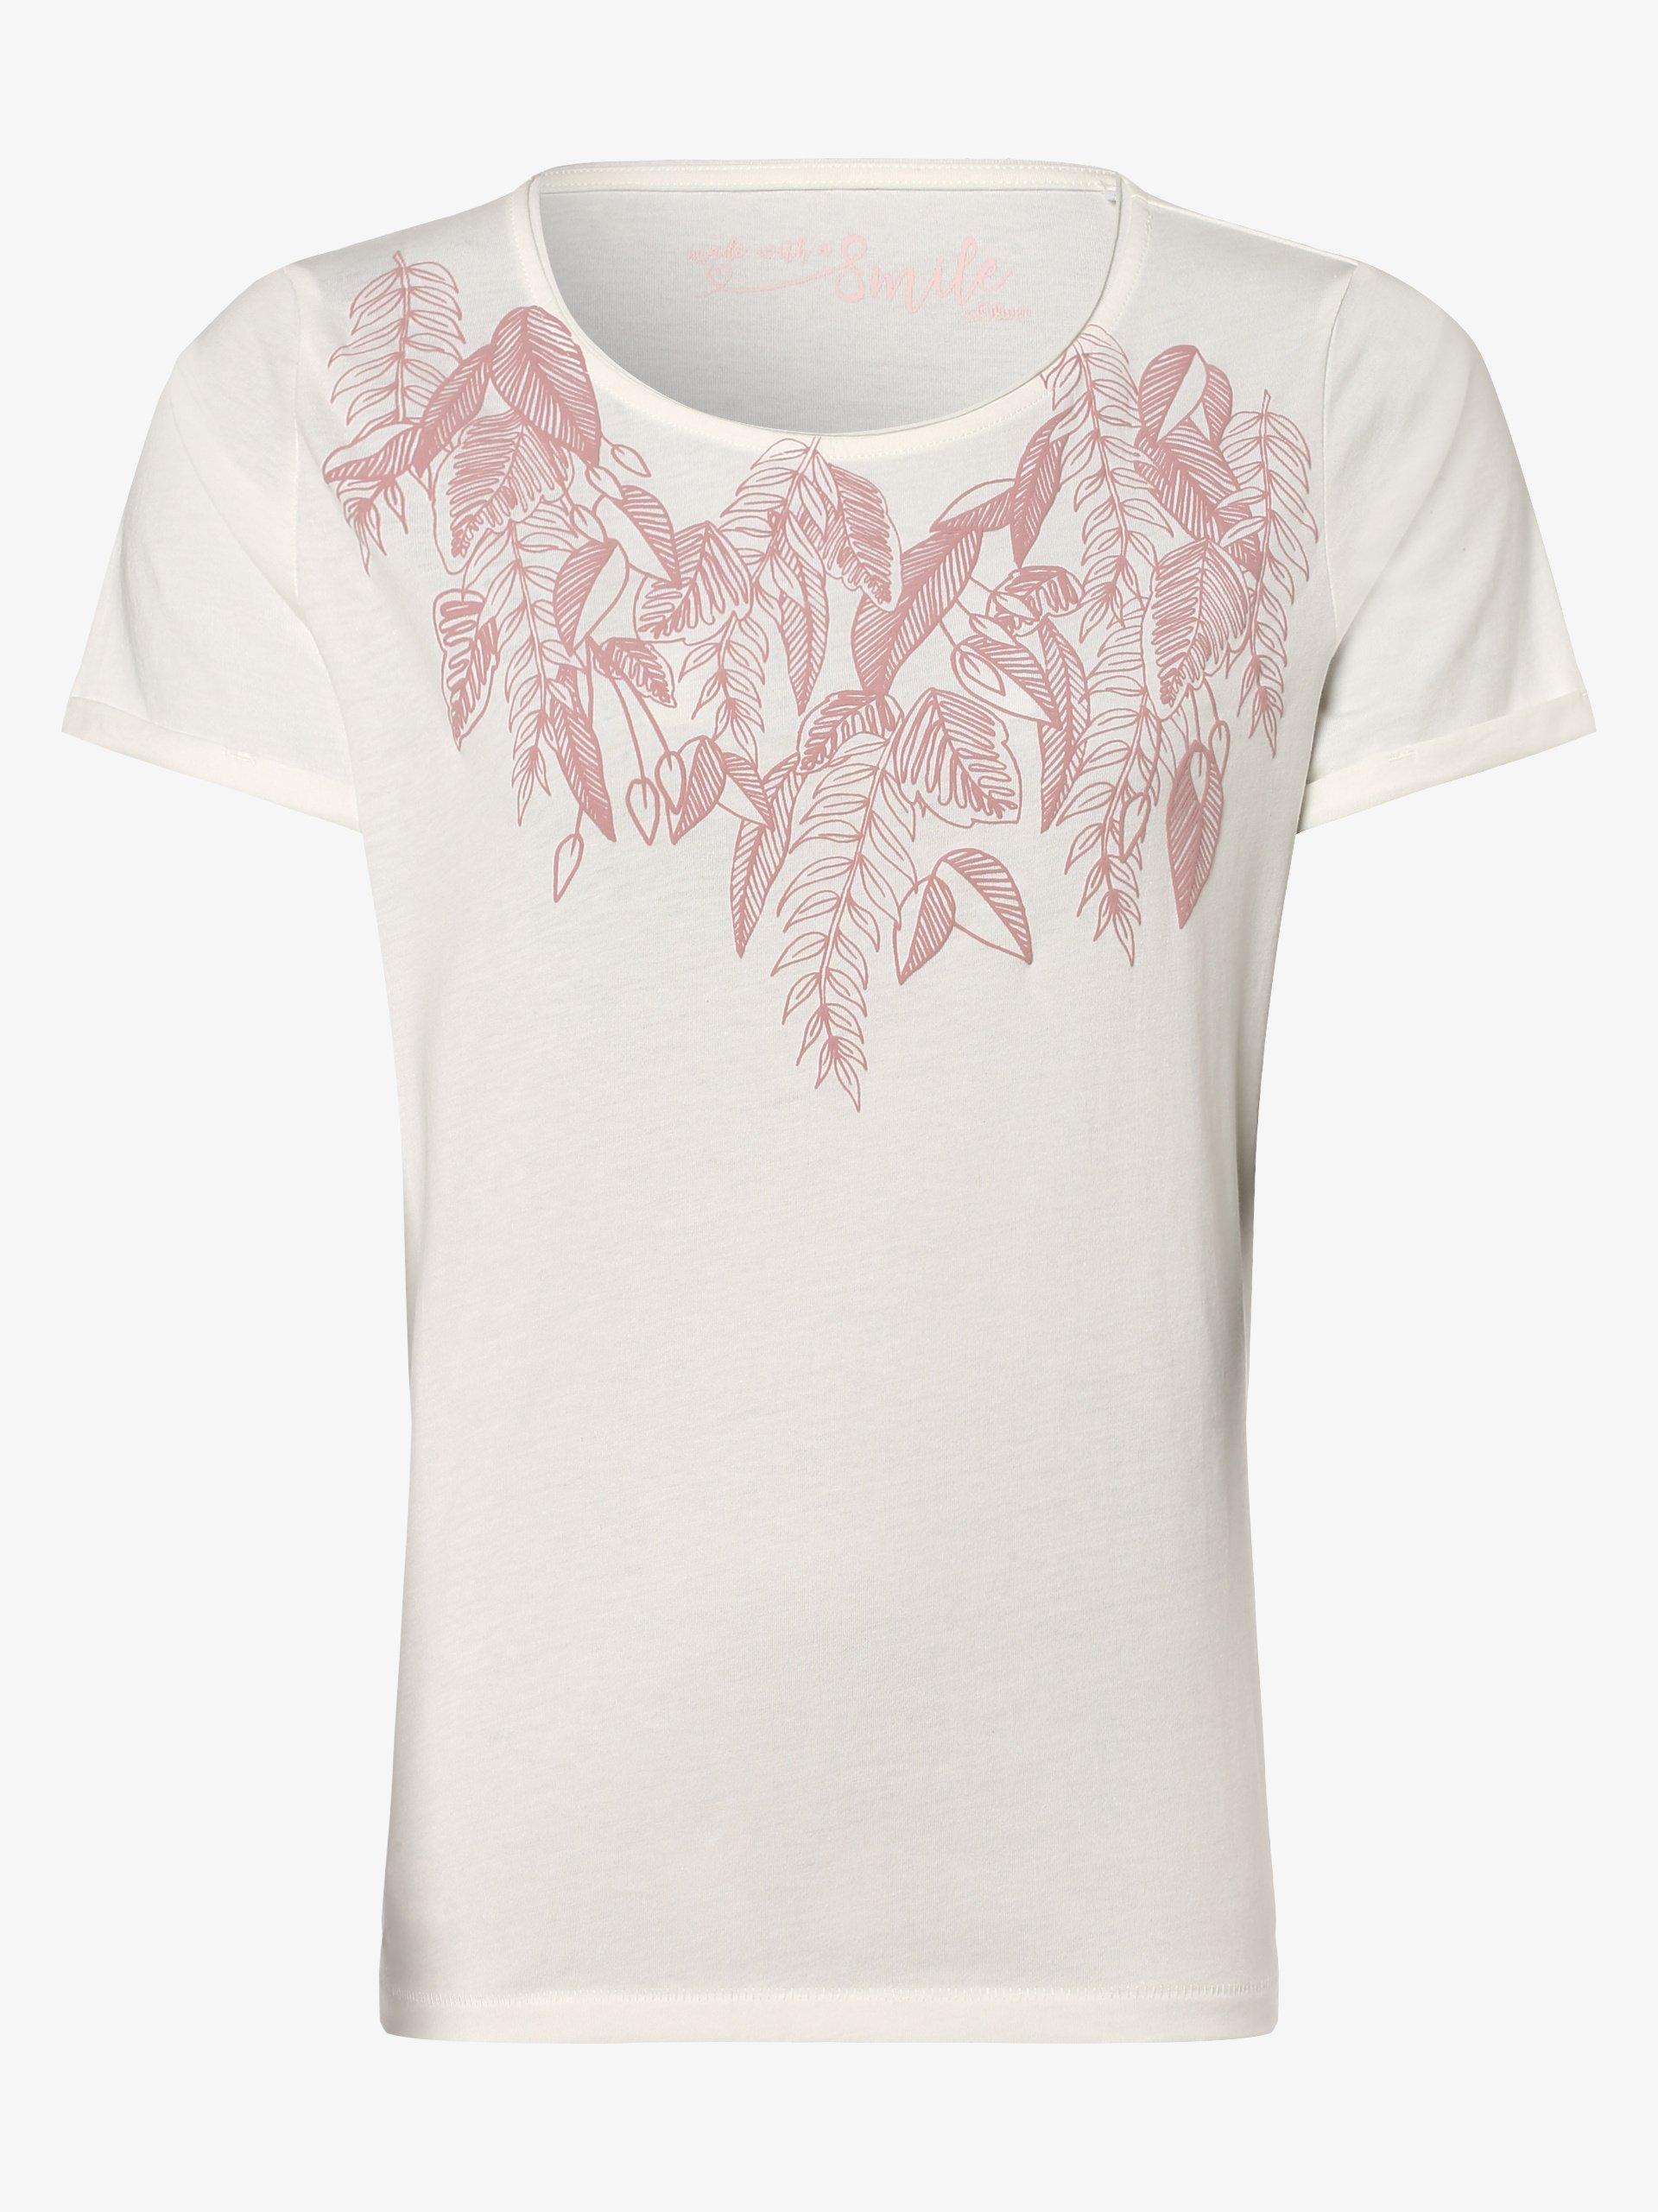 s.Oliver Casual T-shirt damski